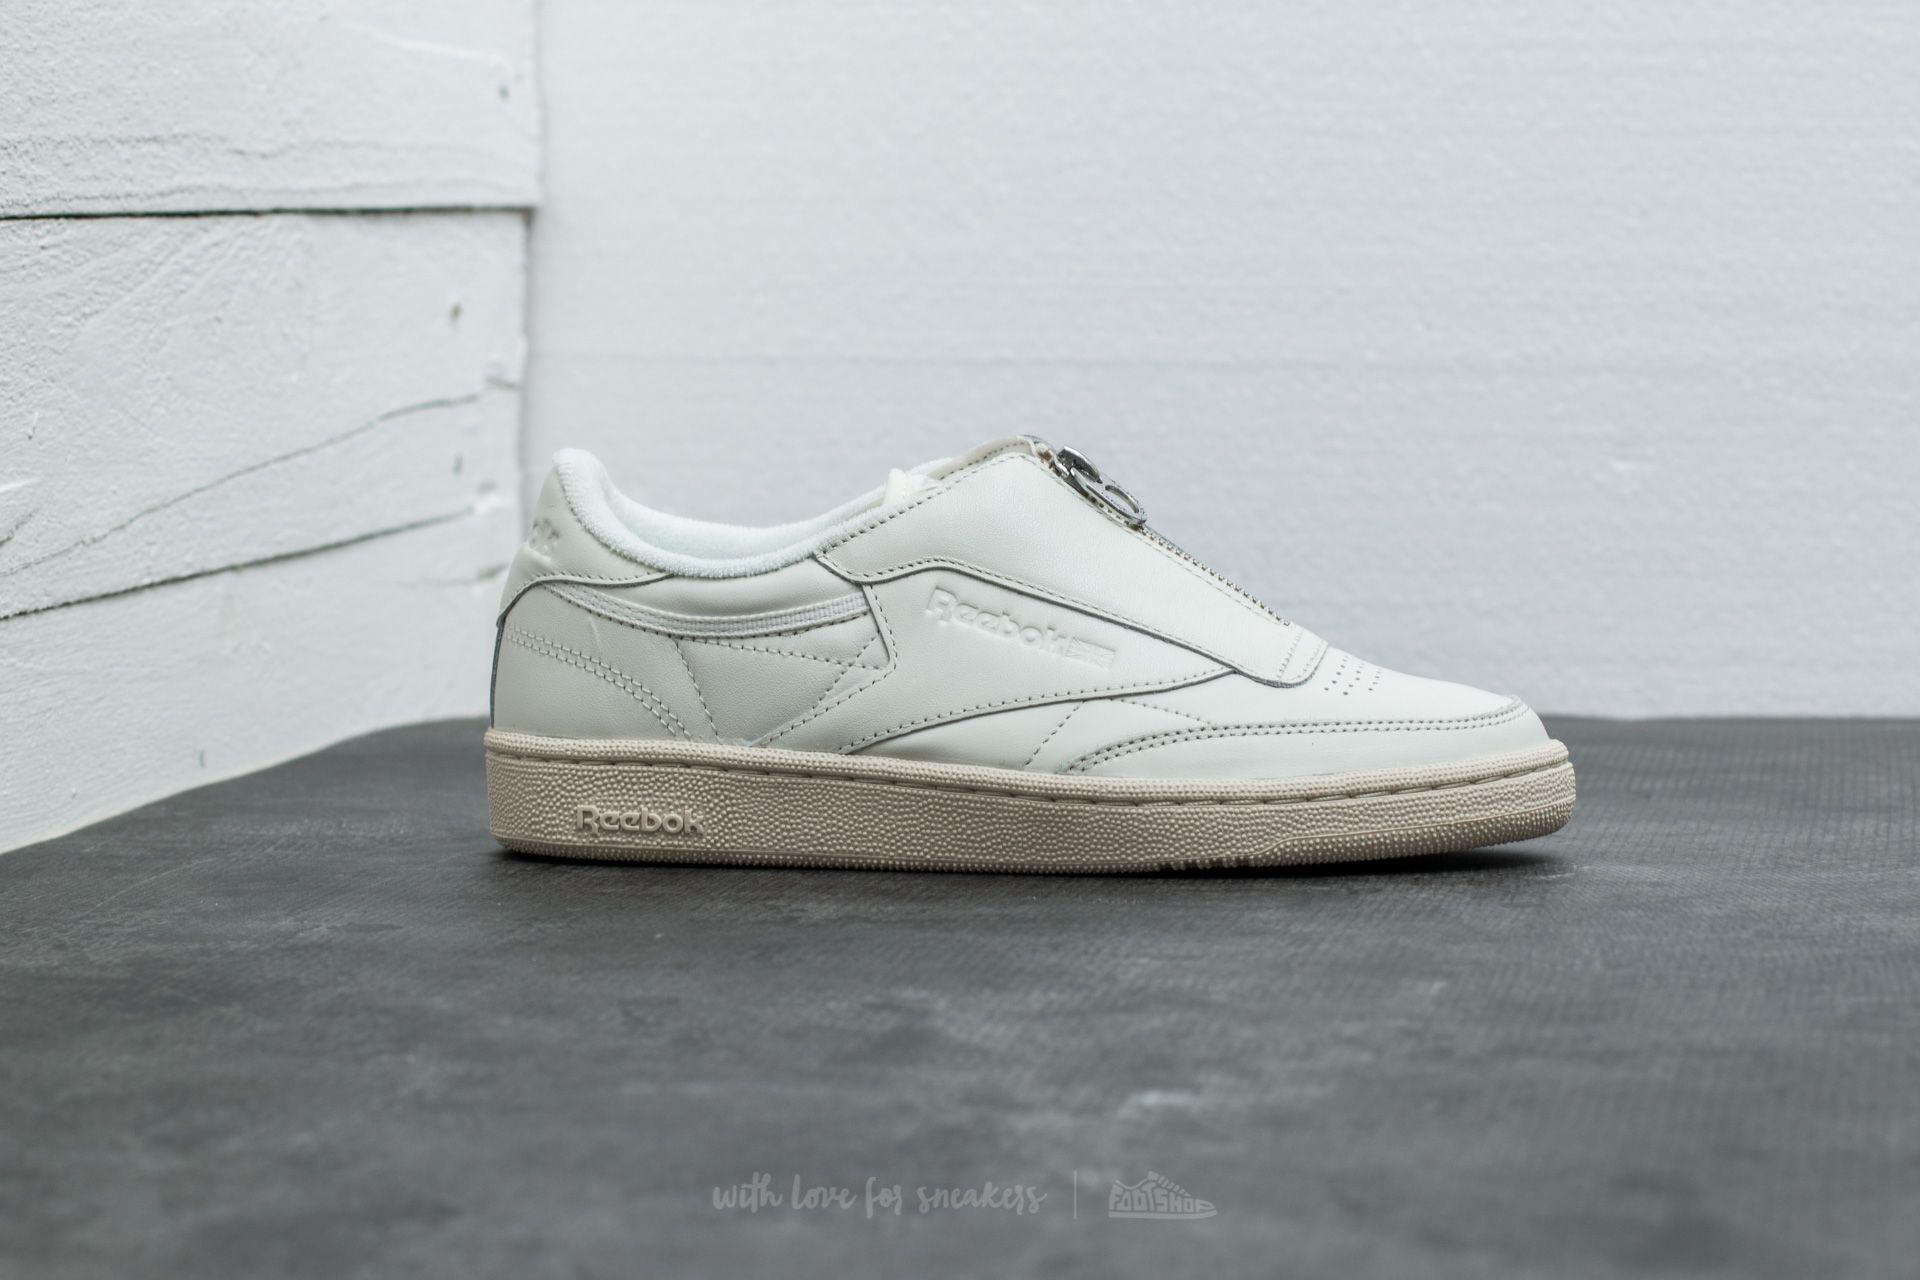 fc46688c5f1 Lyst - Reebok Club C 85 Zip Chalk  Sandstone  White  Silver